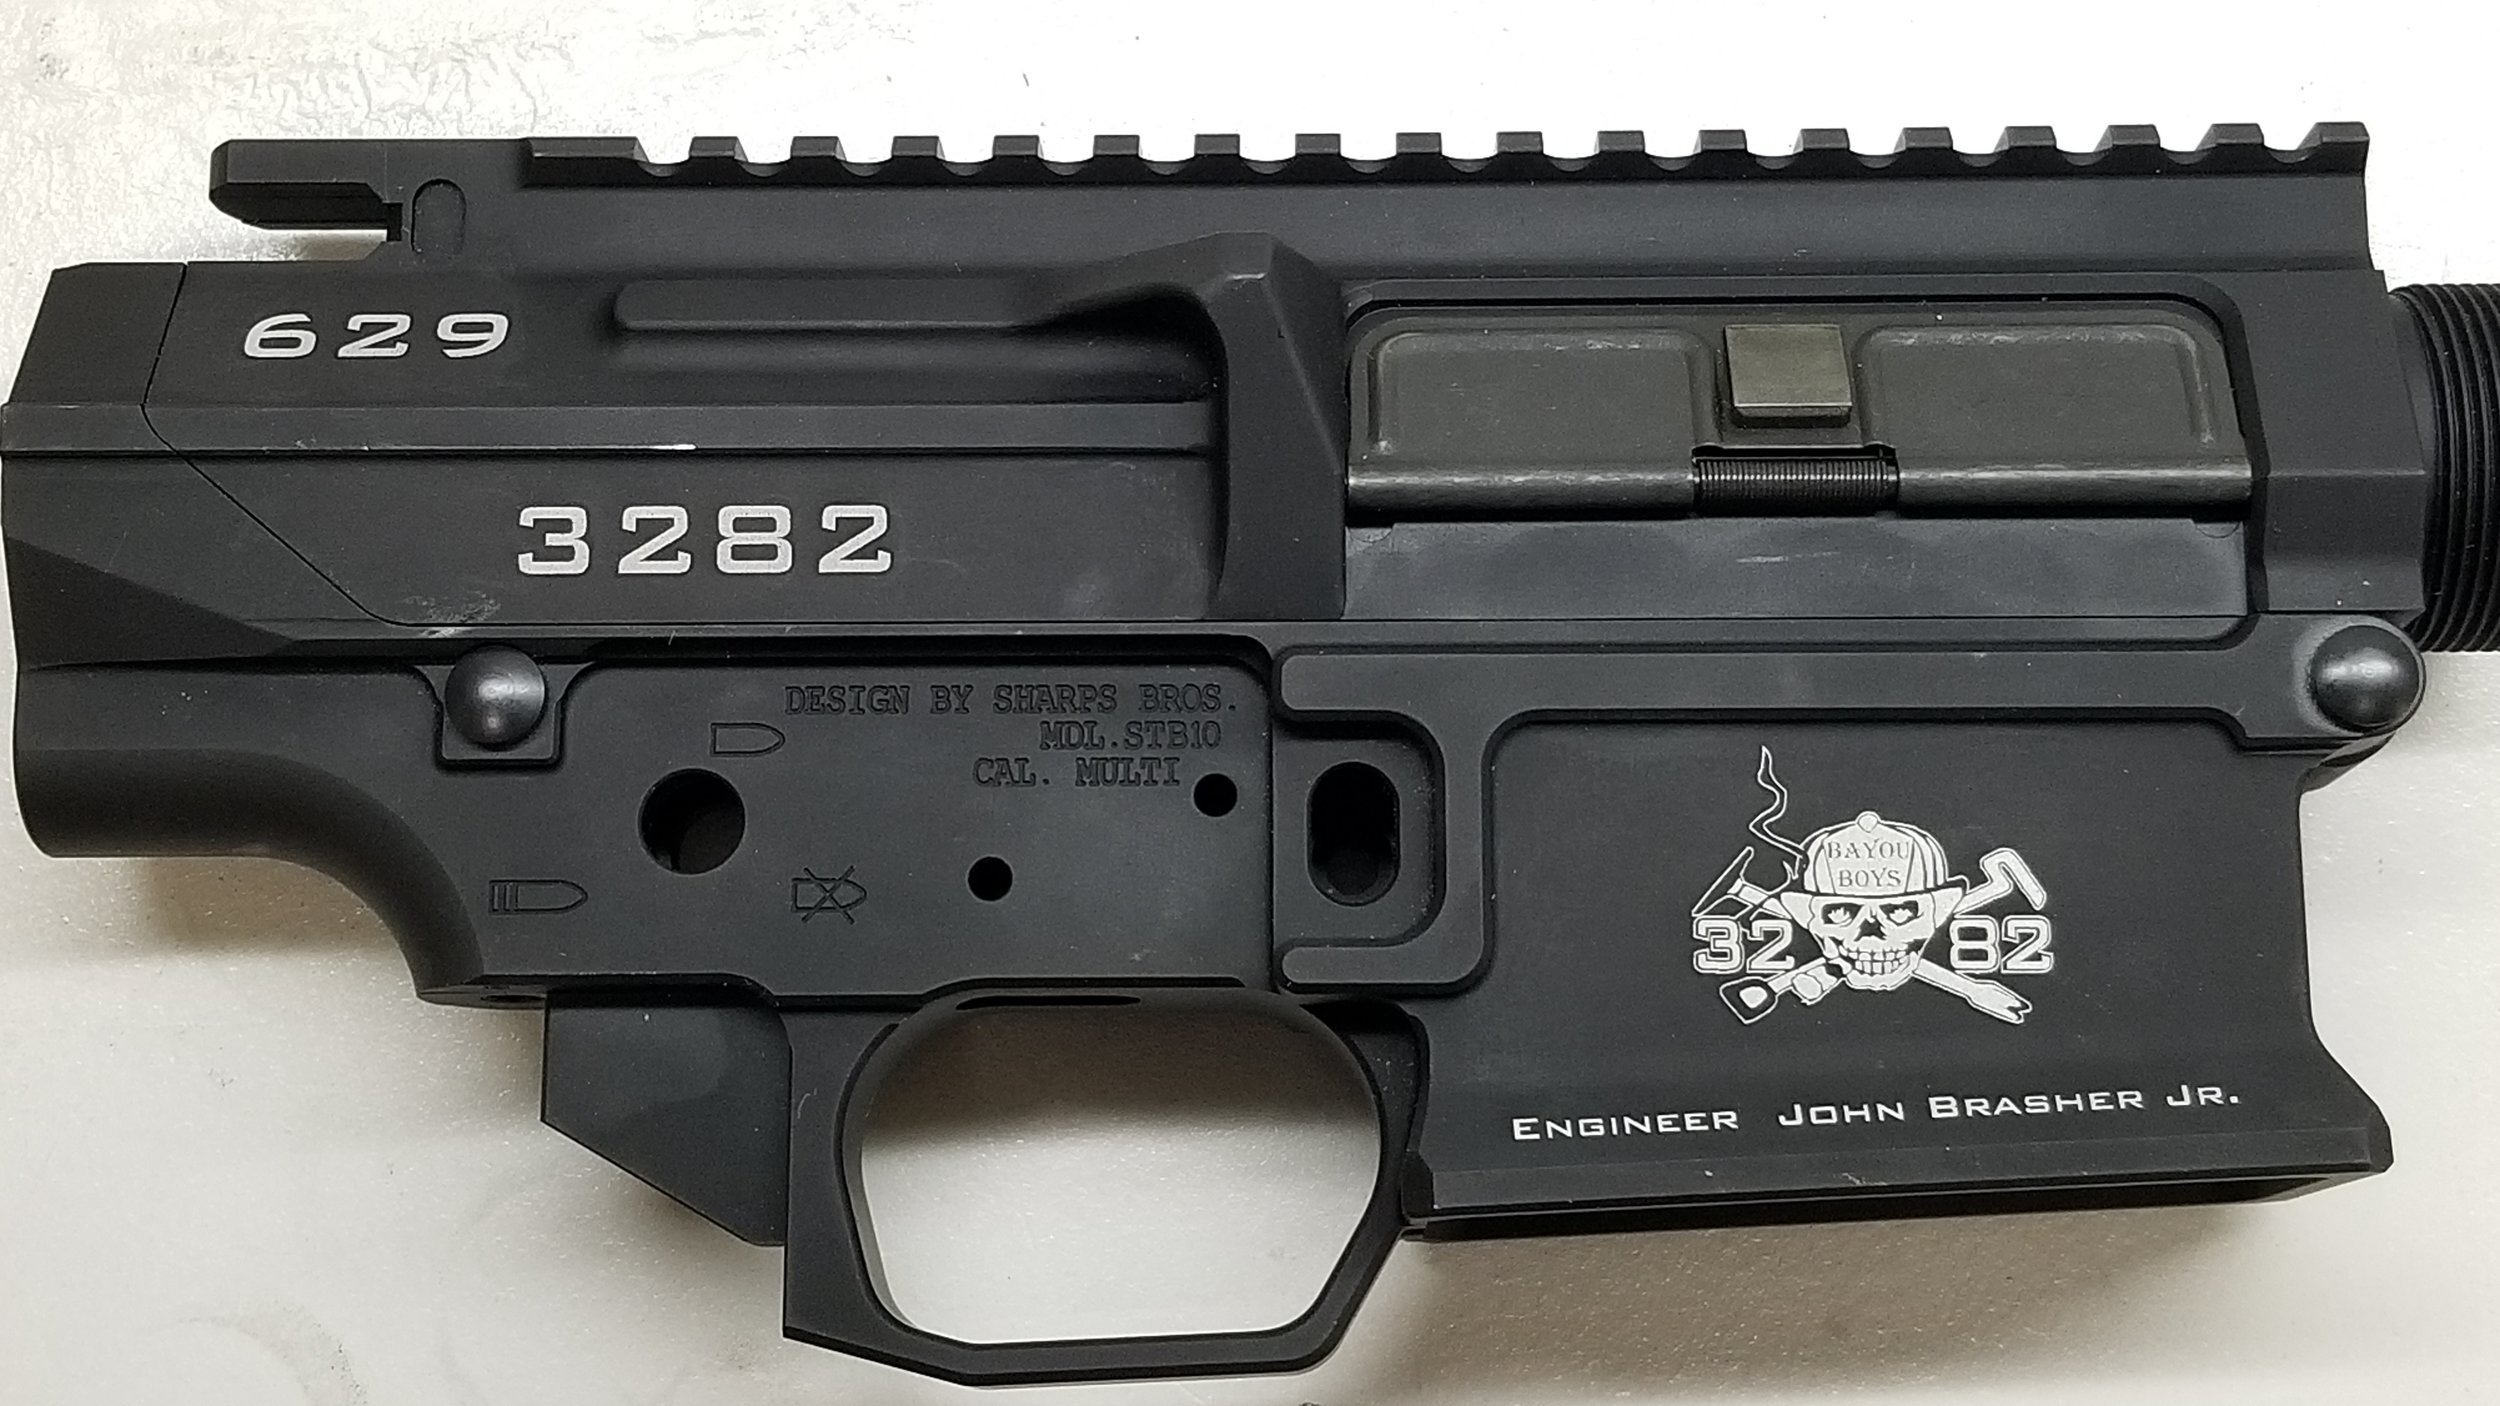 Engraved Assault Rifle - Personalized Assault Rifle - Custom Assault Rifle - Firearm Engraving Projects - Engrave It Houston